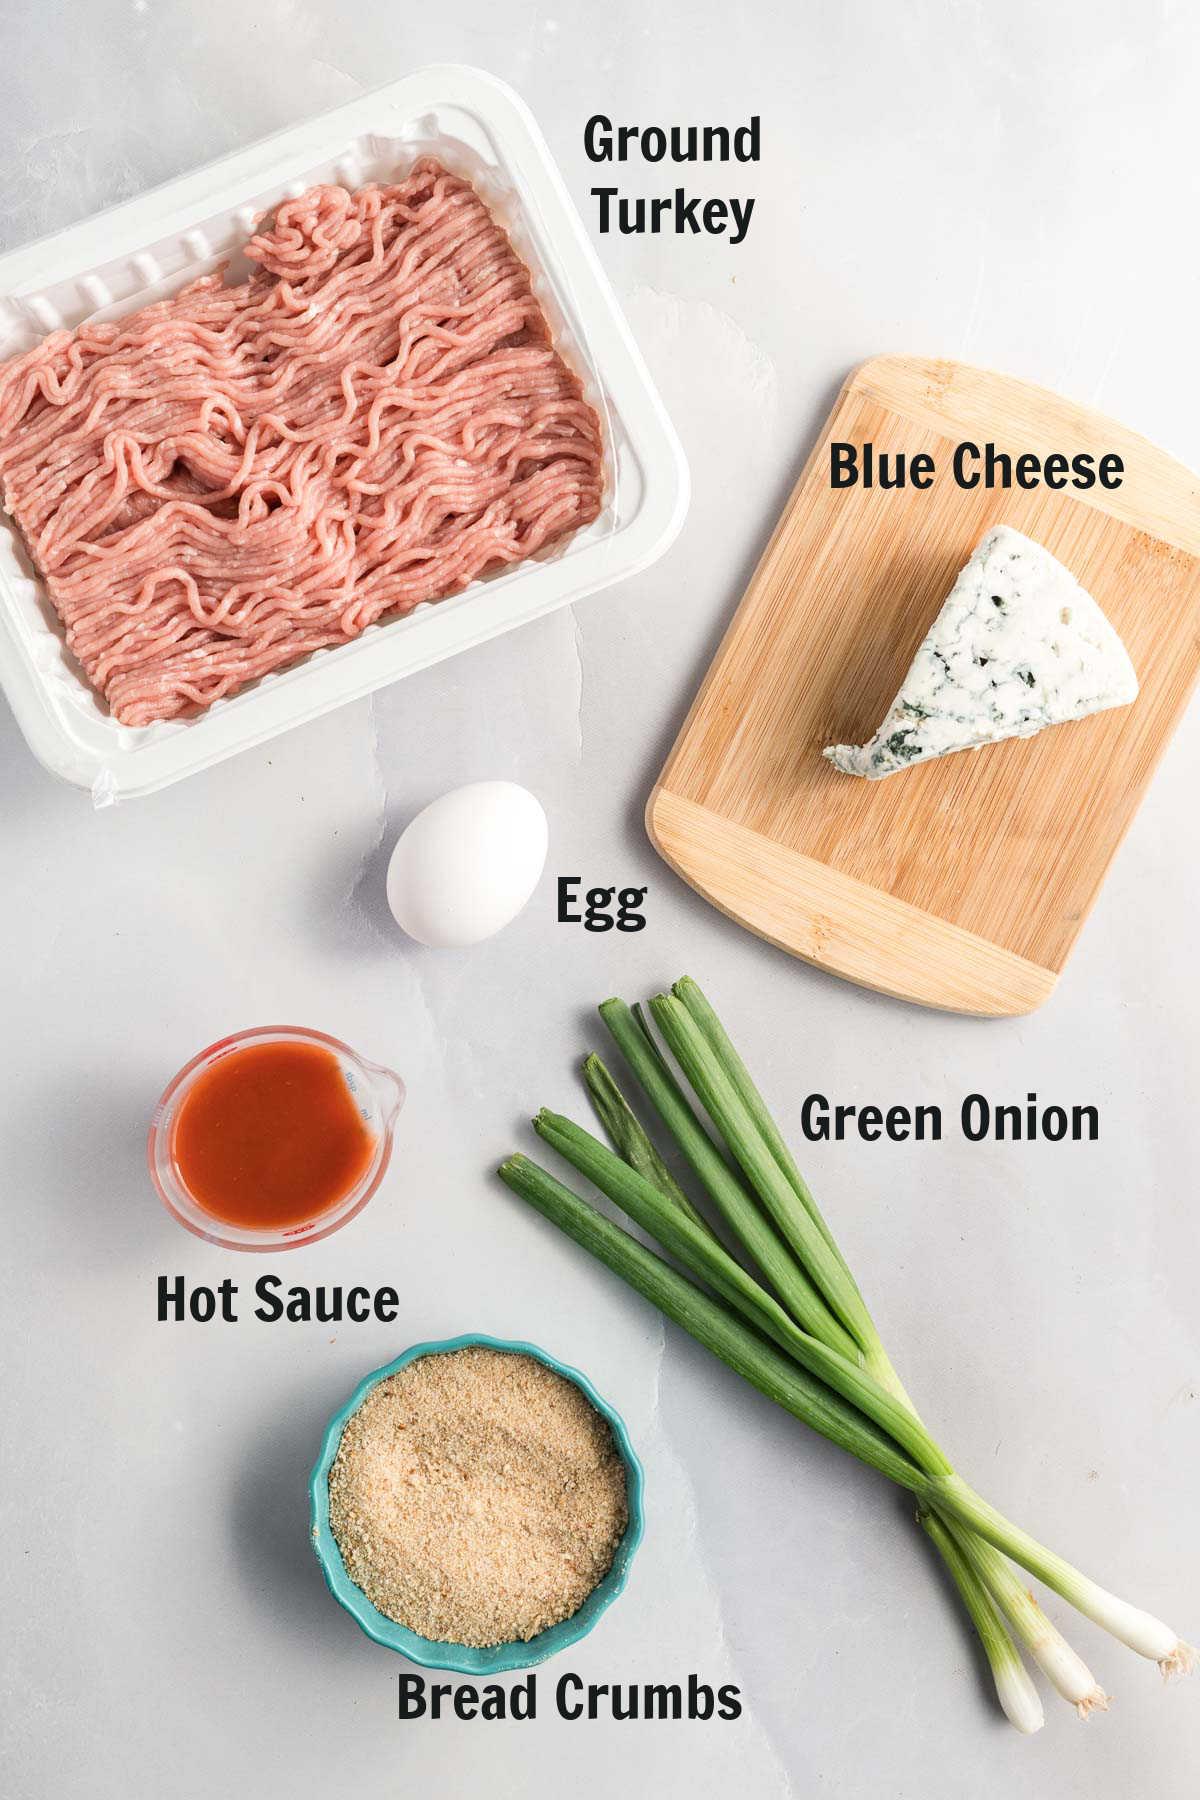 Turkey meatball ingredients.